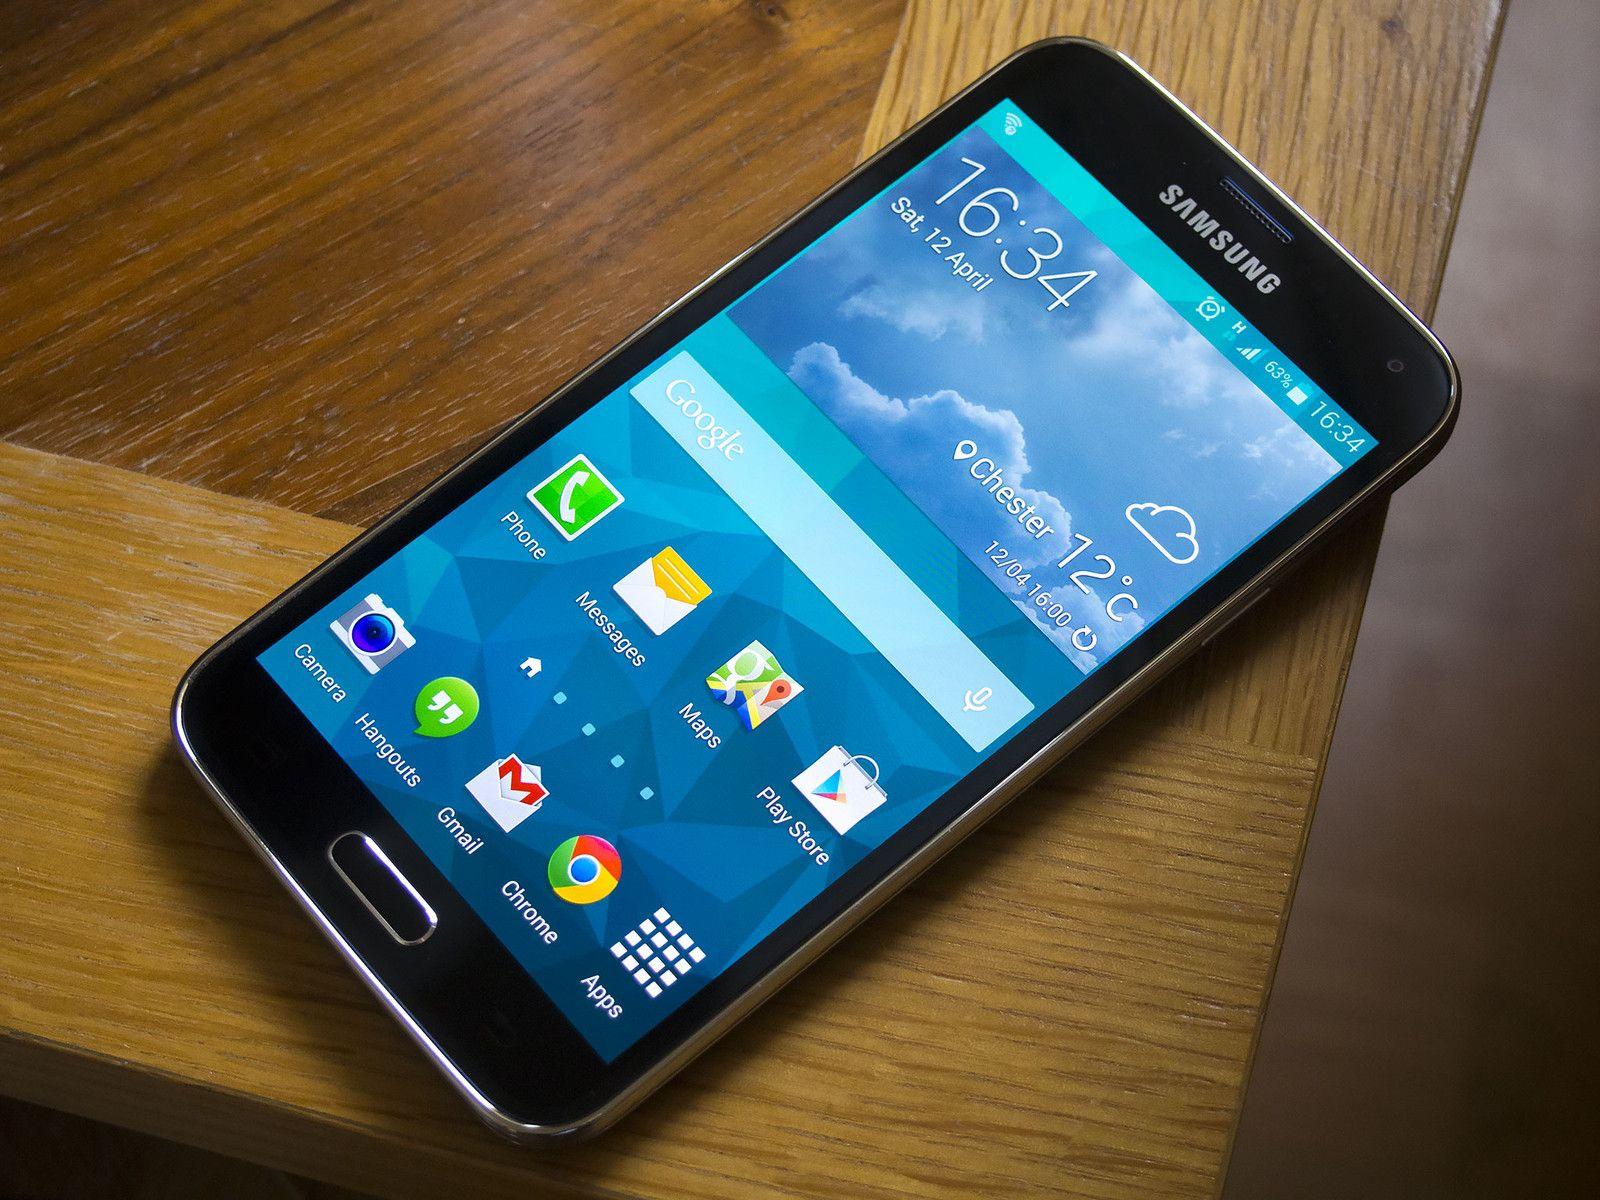 Pin by PropertyRoom com on Electronics | Samsung galaxy s5